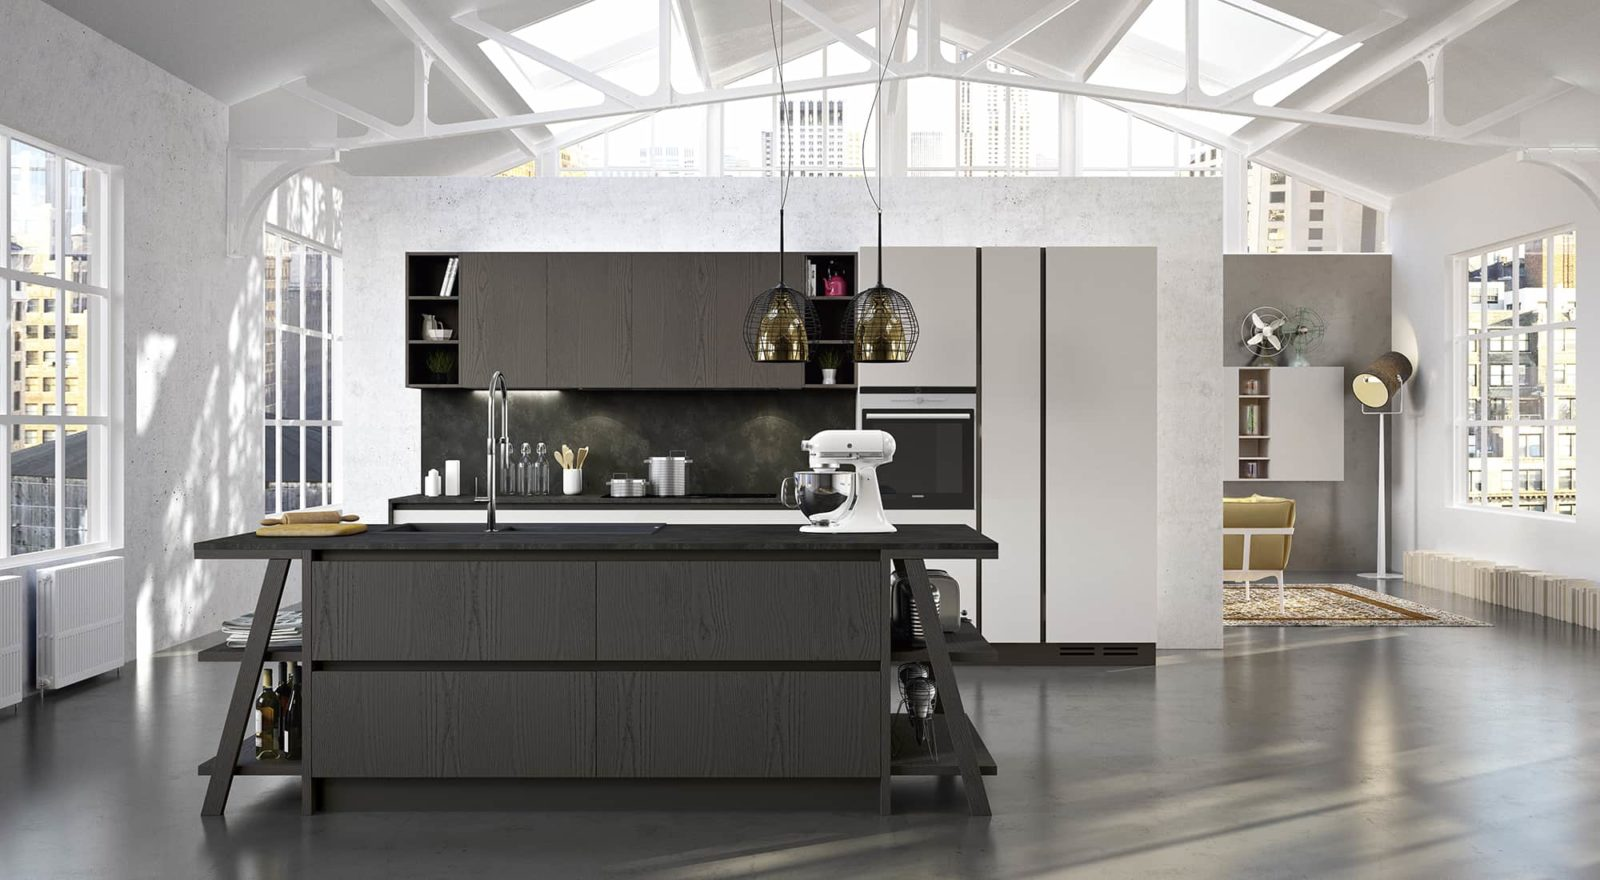 Cucina moderna con isola arredamenti meneghello - Cucina moderna oro ...